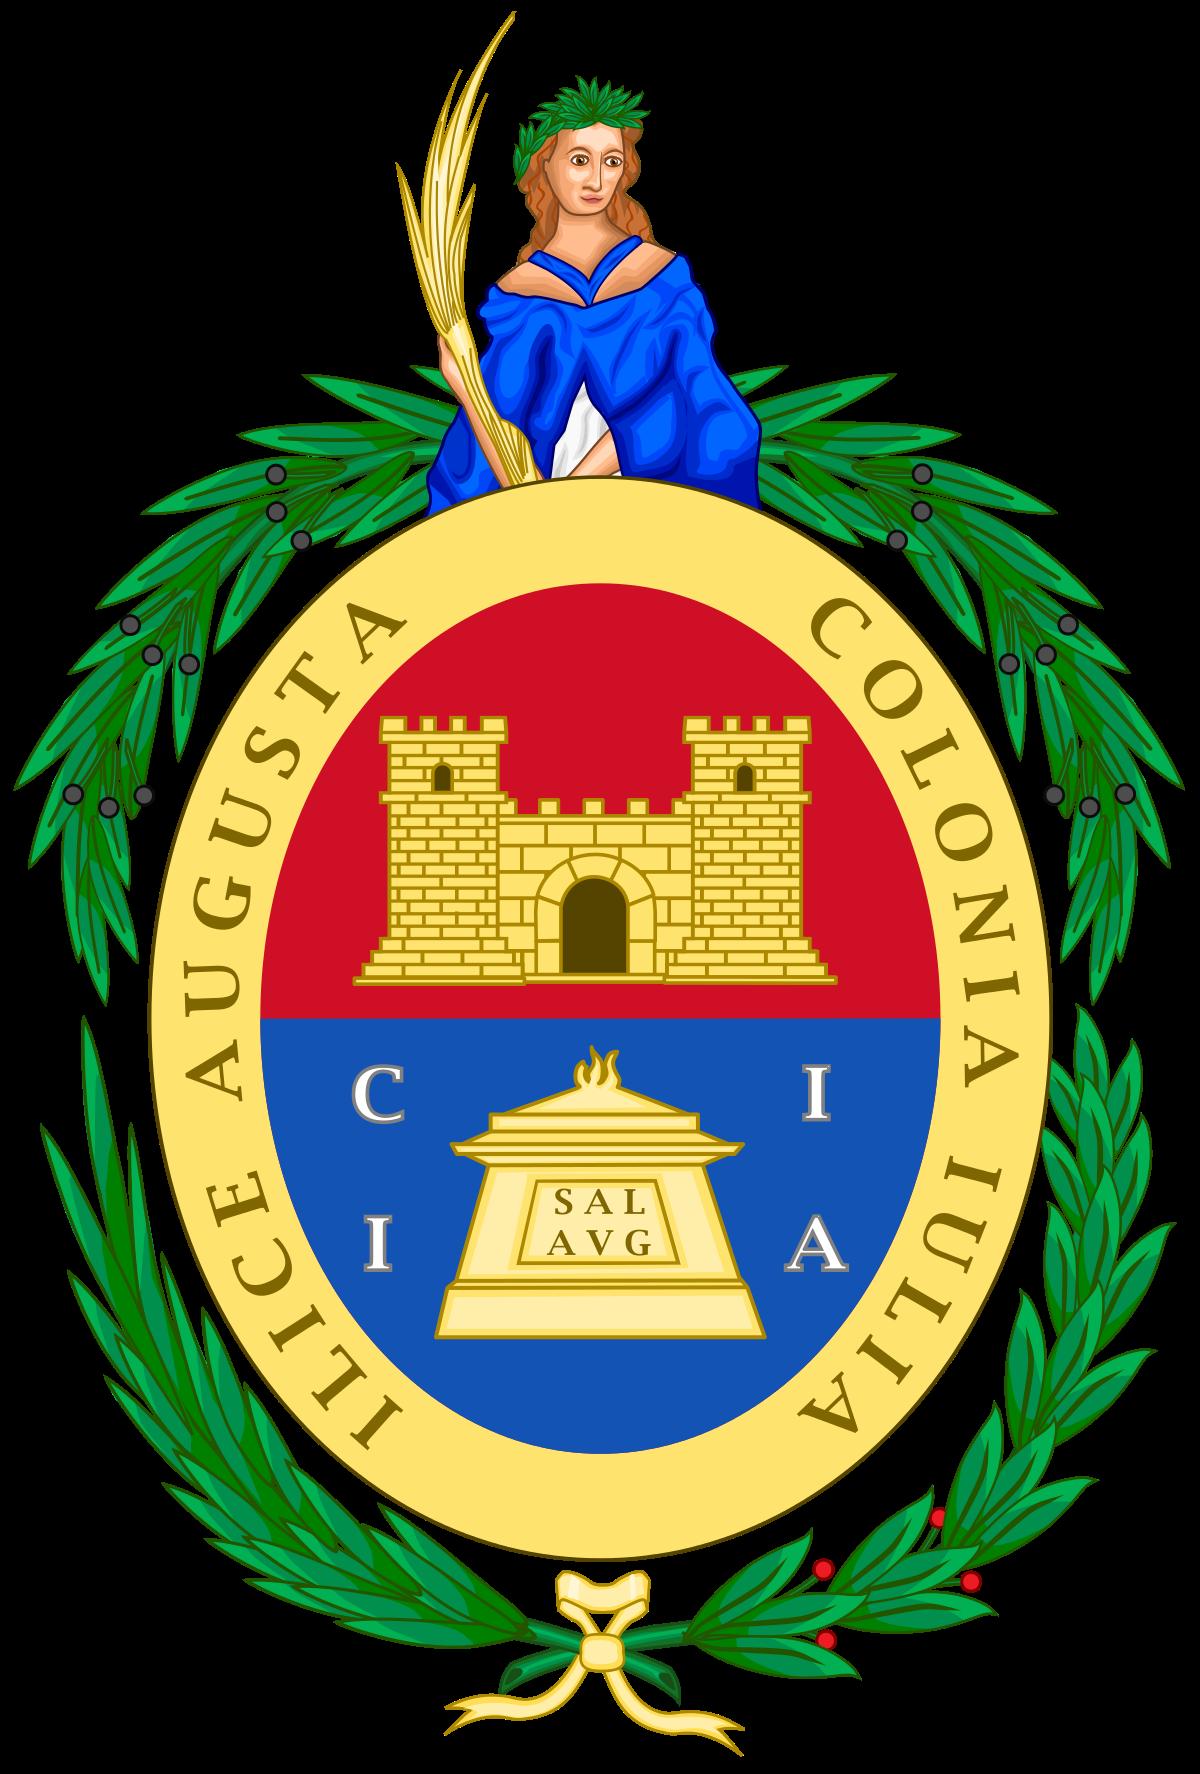 Legislación municipal en materia animal de Valencia para Elche